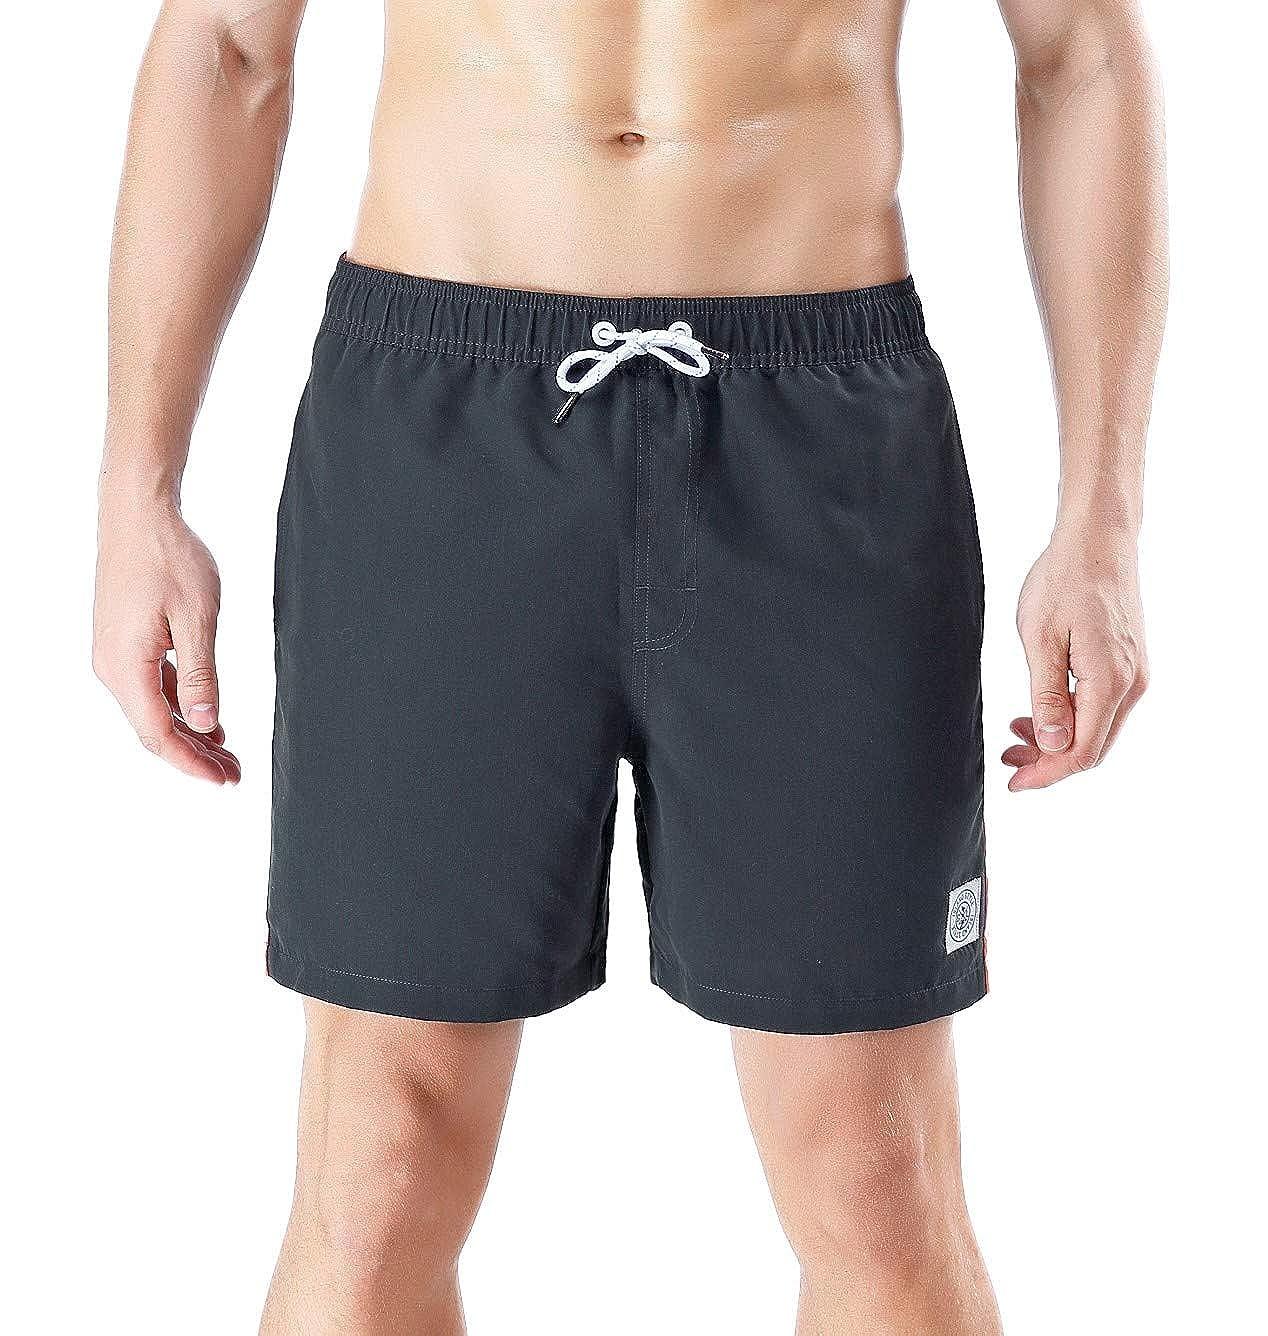 QRANSS Mens Short Swim Trunks Boys Quick Dry Beach Broad Shorts Swim Suit with Mesh Lining